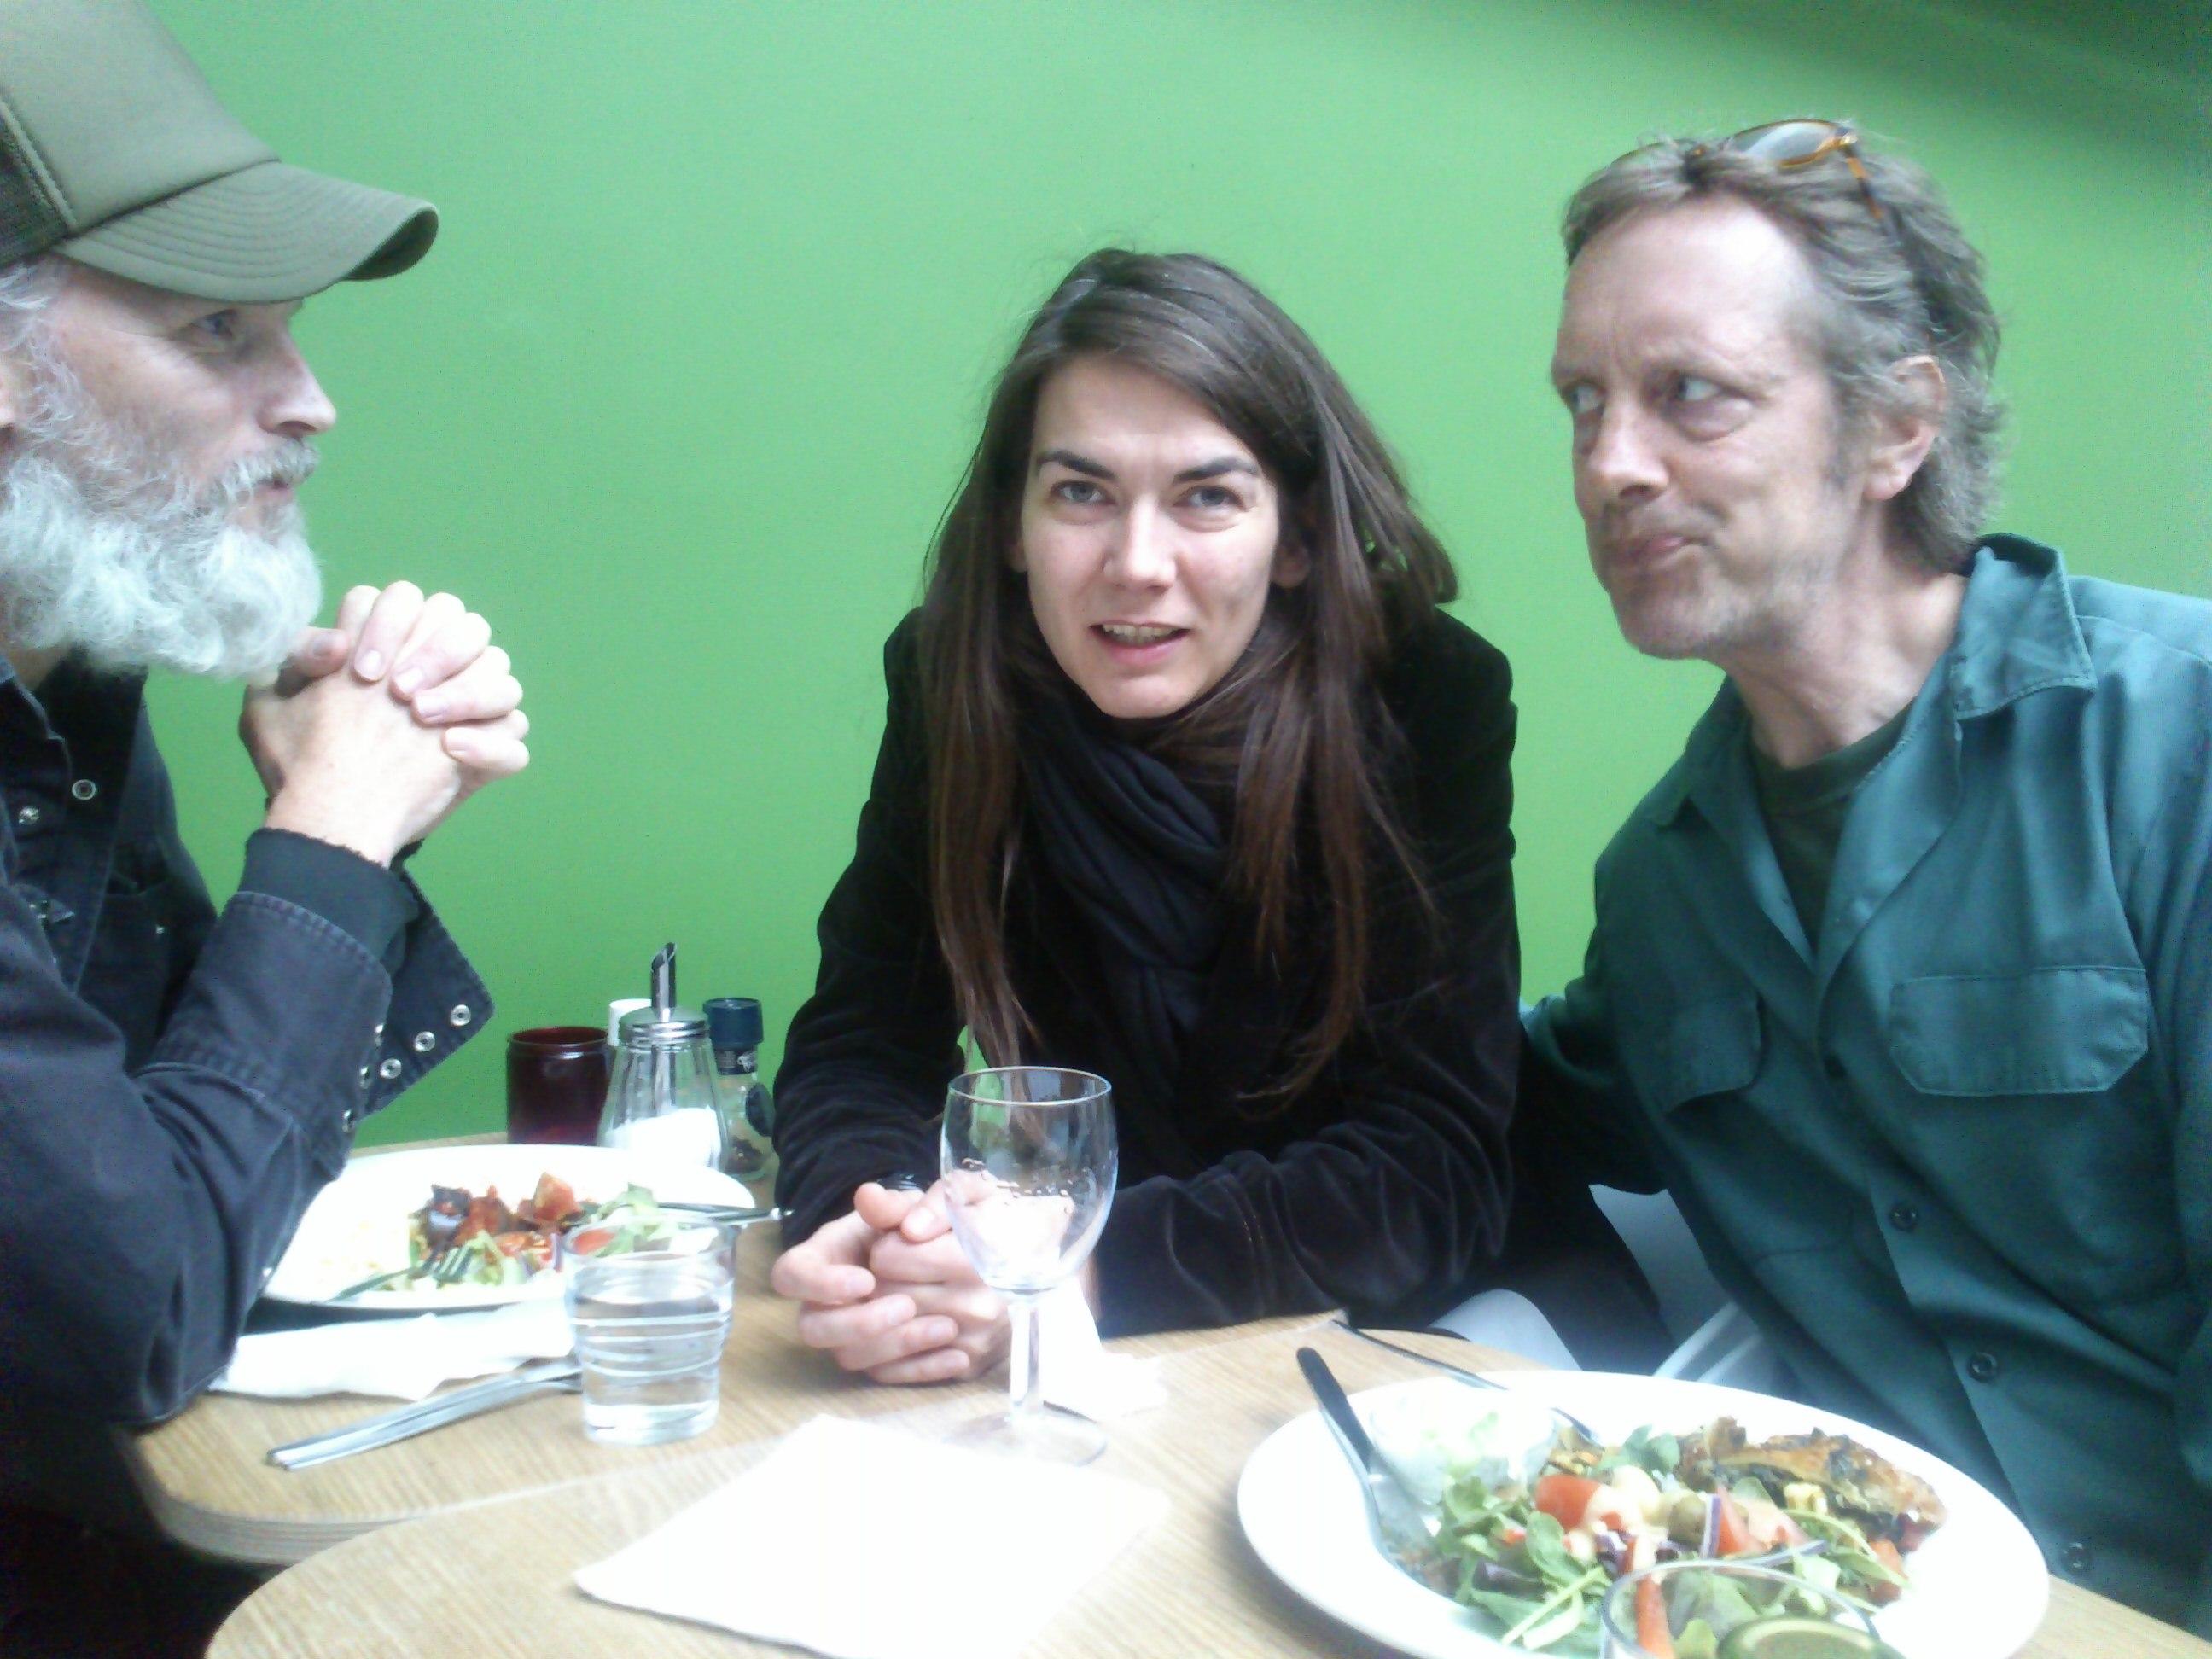 Matthew Barney & Jonathan Bepler